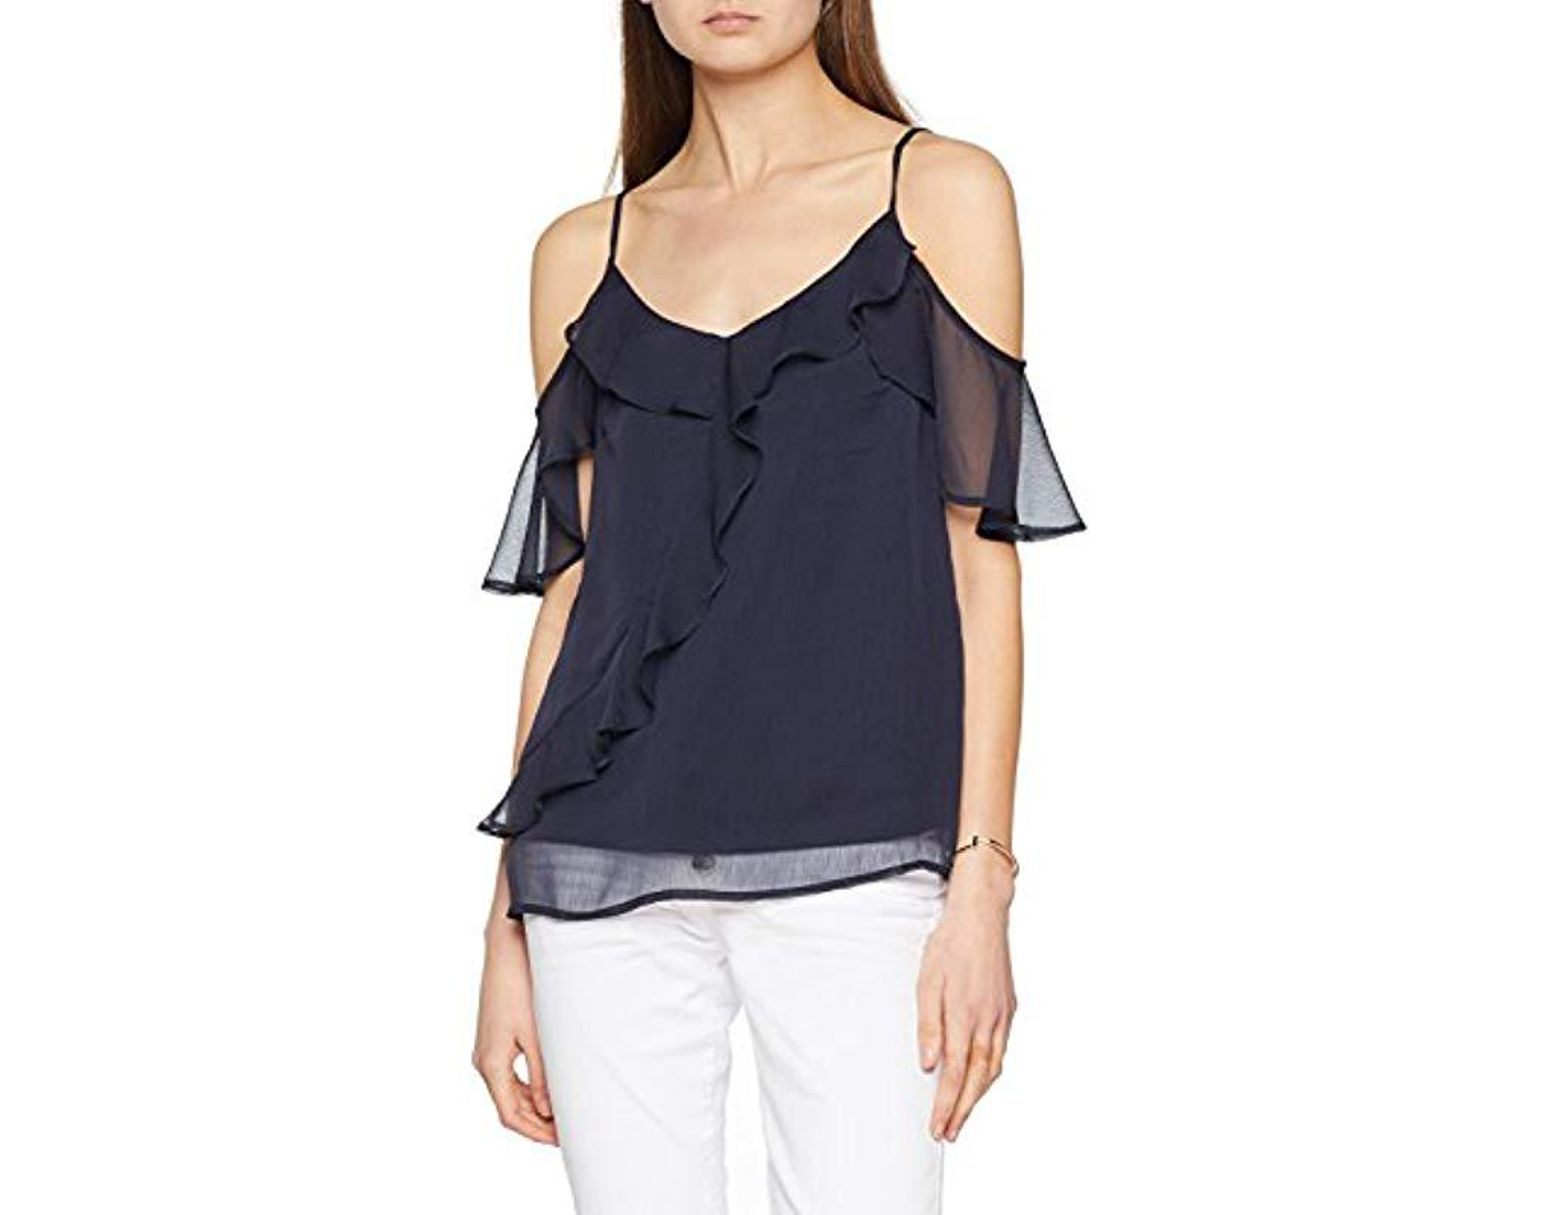 Women's Blue Vmkenzie Cold Shoulder Top Vest